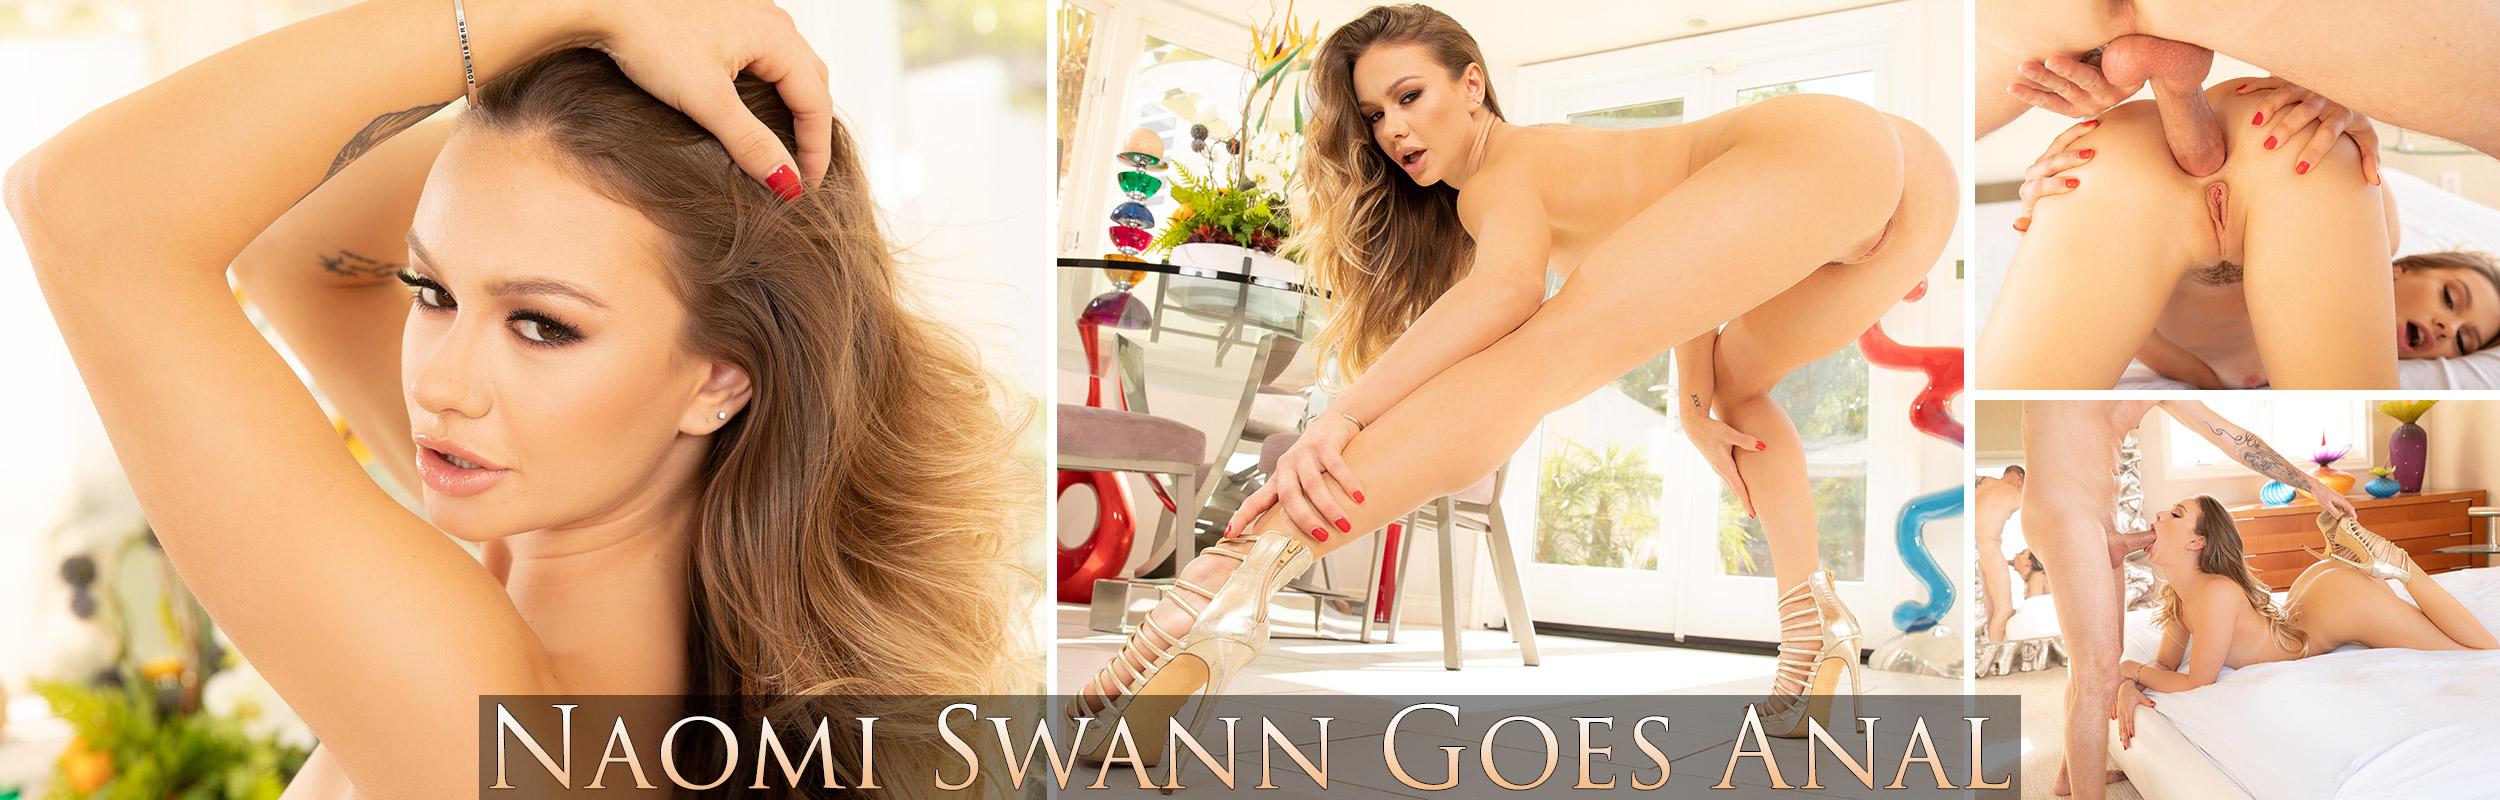 Naomi Swann Goes Anal